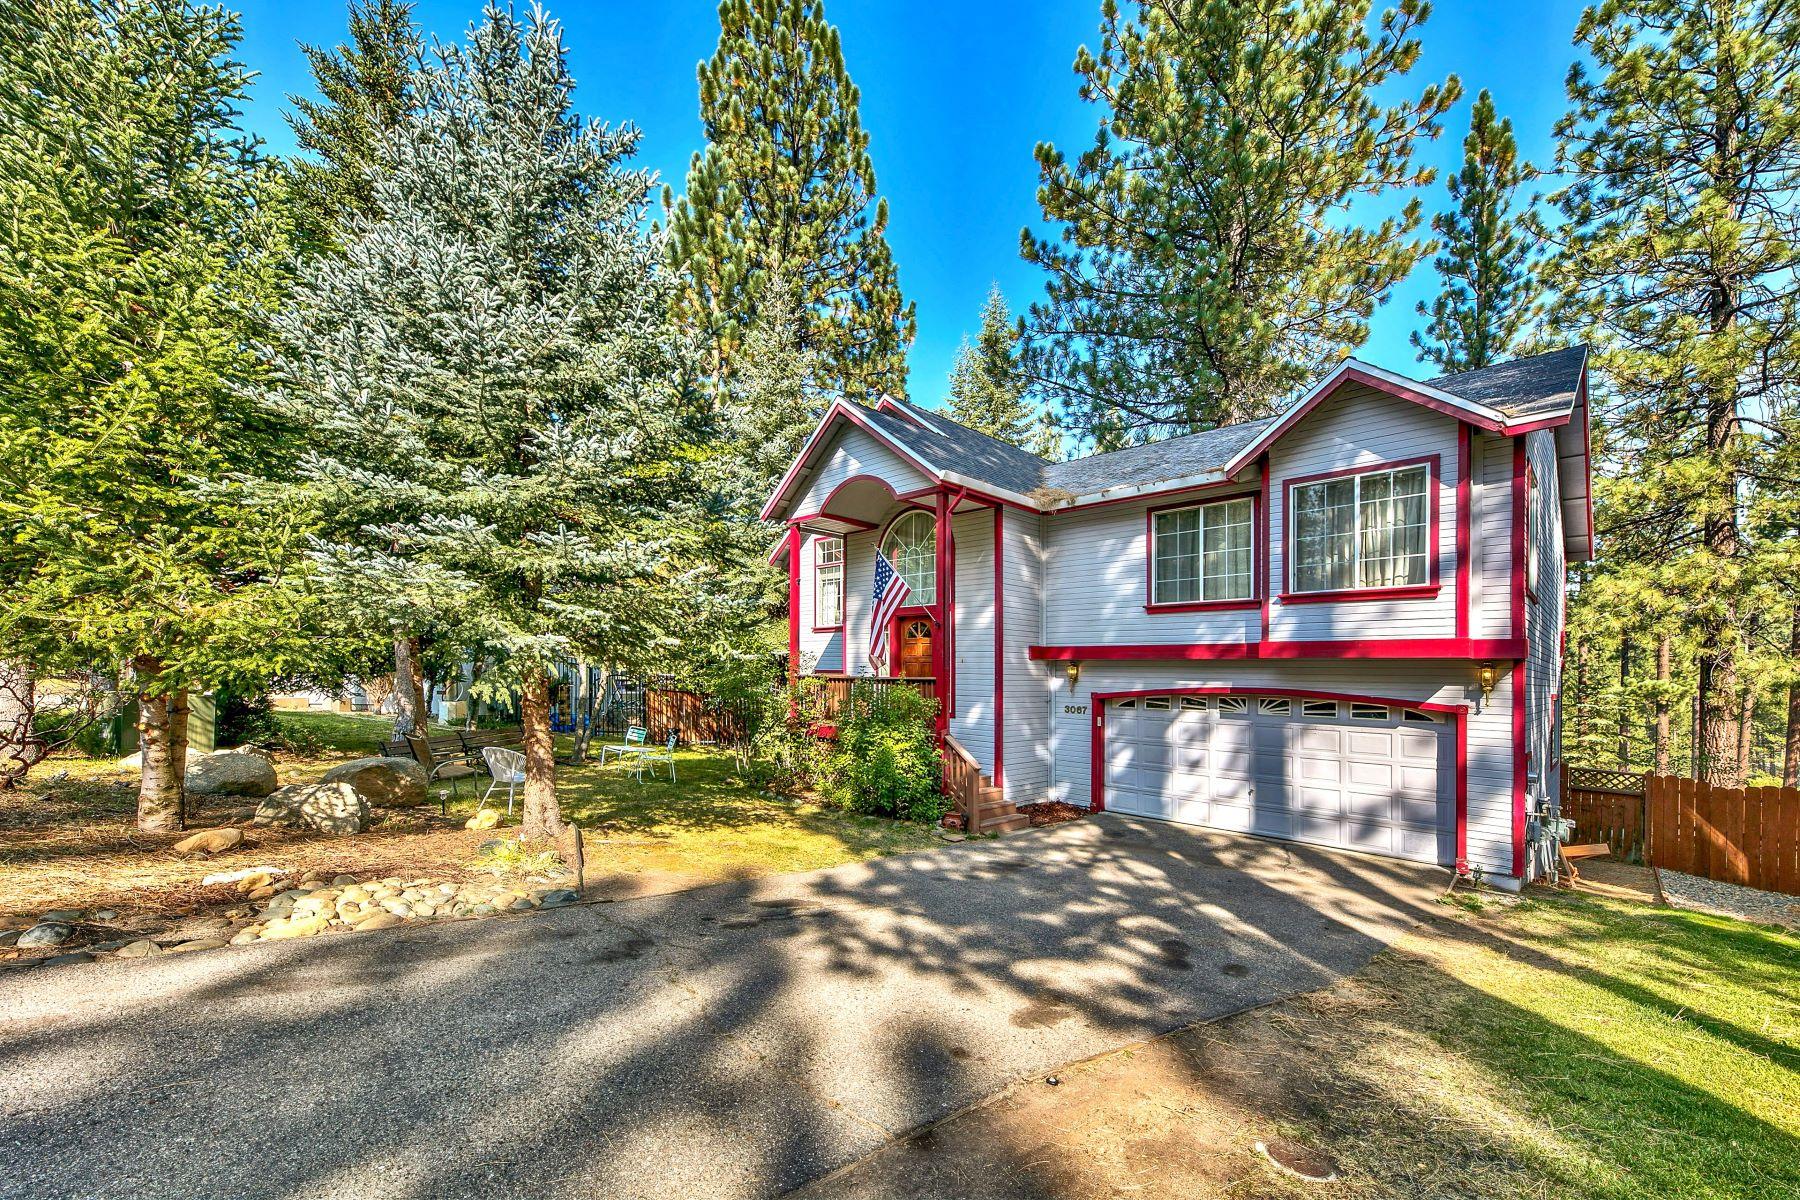 Property for Active at Kokanee Estates Mountain Home 3067 Kokanee Trail South Lake Tahoe, California 96150 United States